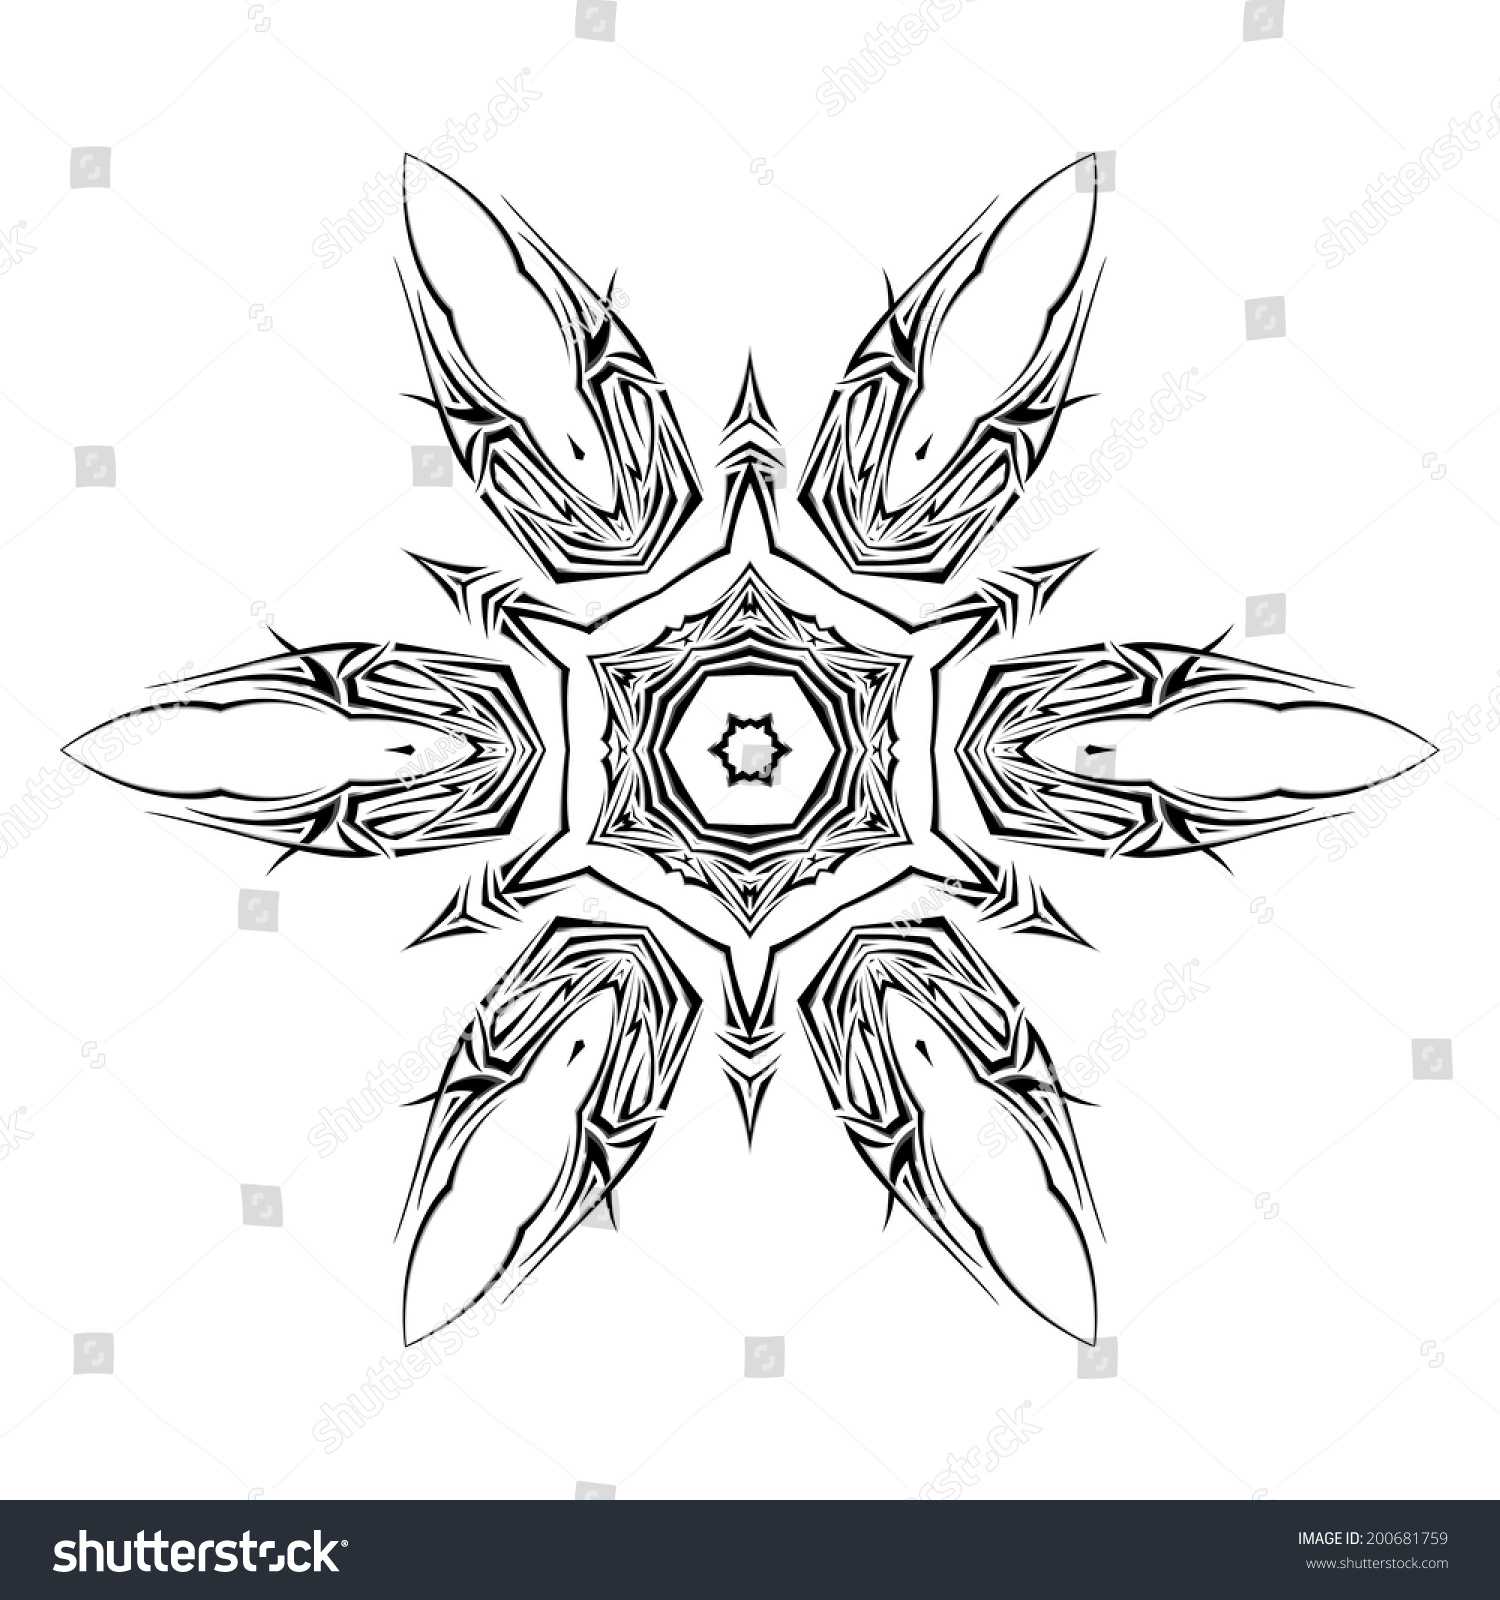 sketch tattoo shuriken on white background stock vector 200681759 shutterstock. Black Bedroom Furniture Sets. Home Design Ideas